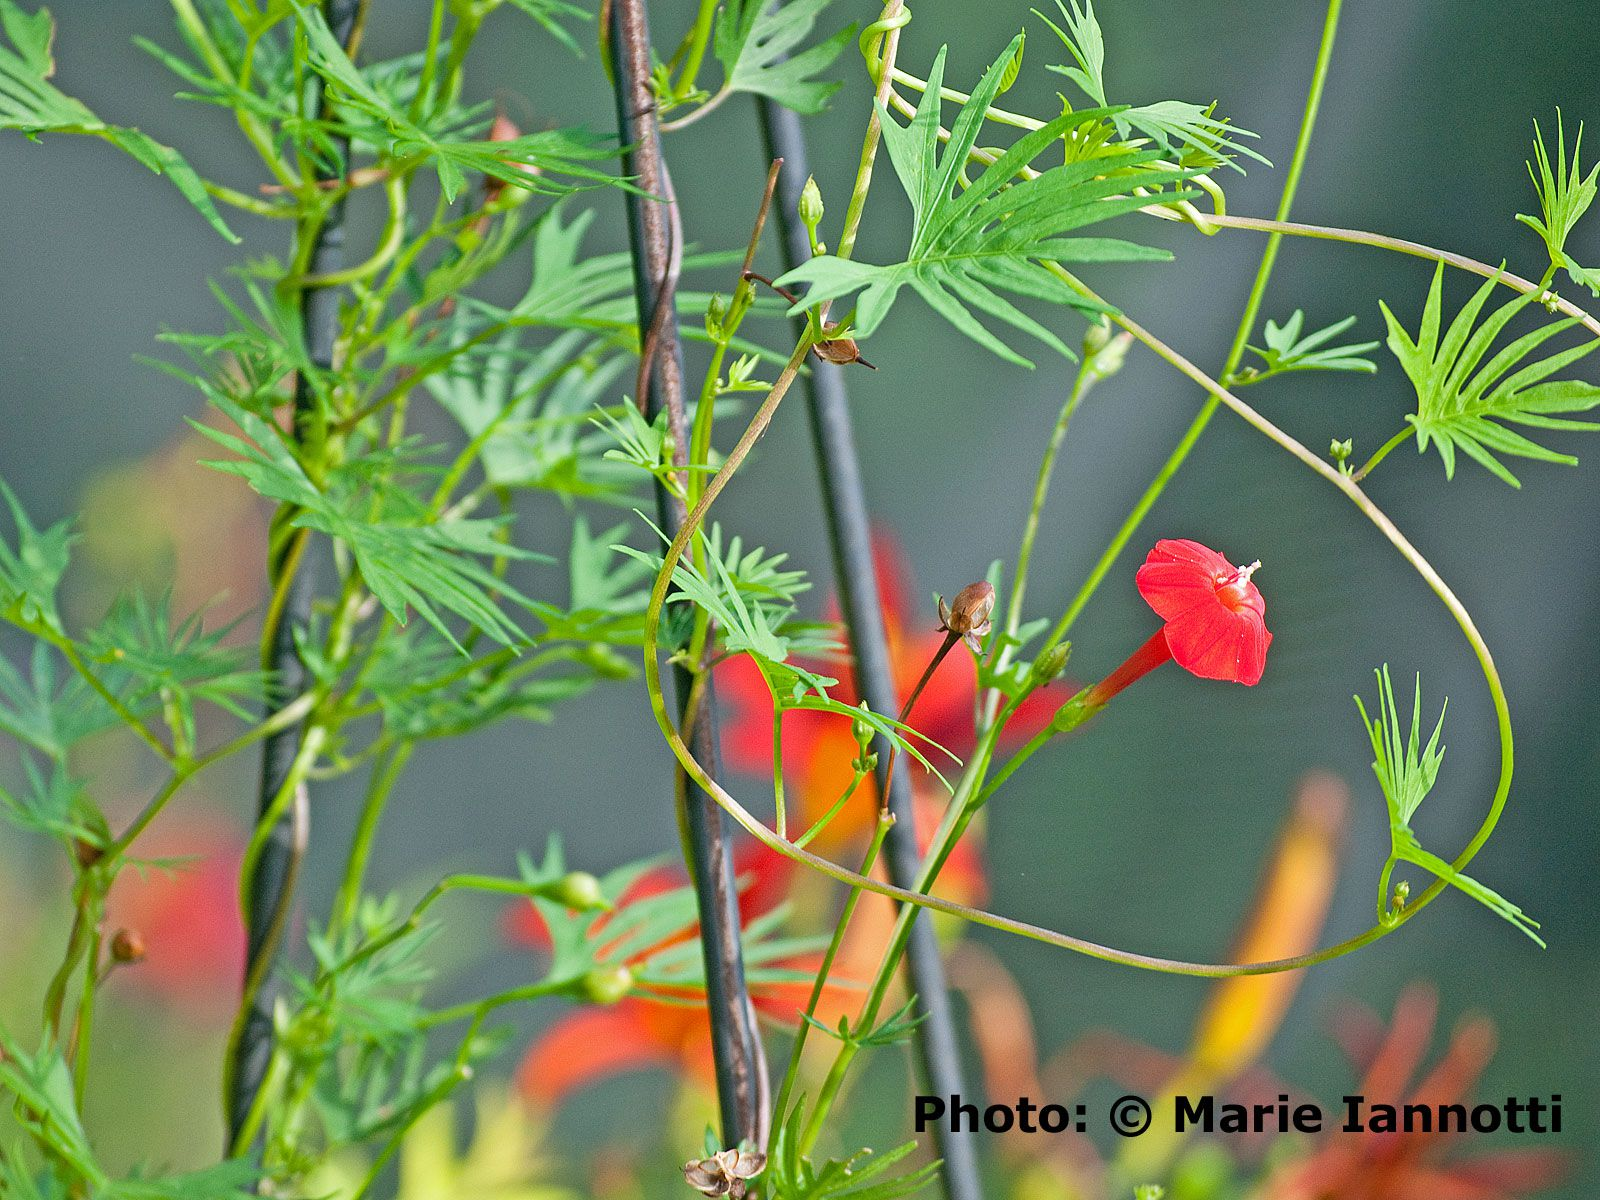 Cardinal Climber Flowering Vine Ipomoea Sloteri